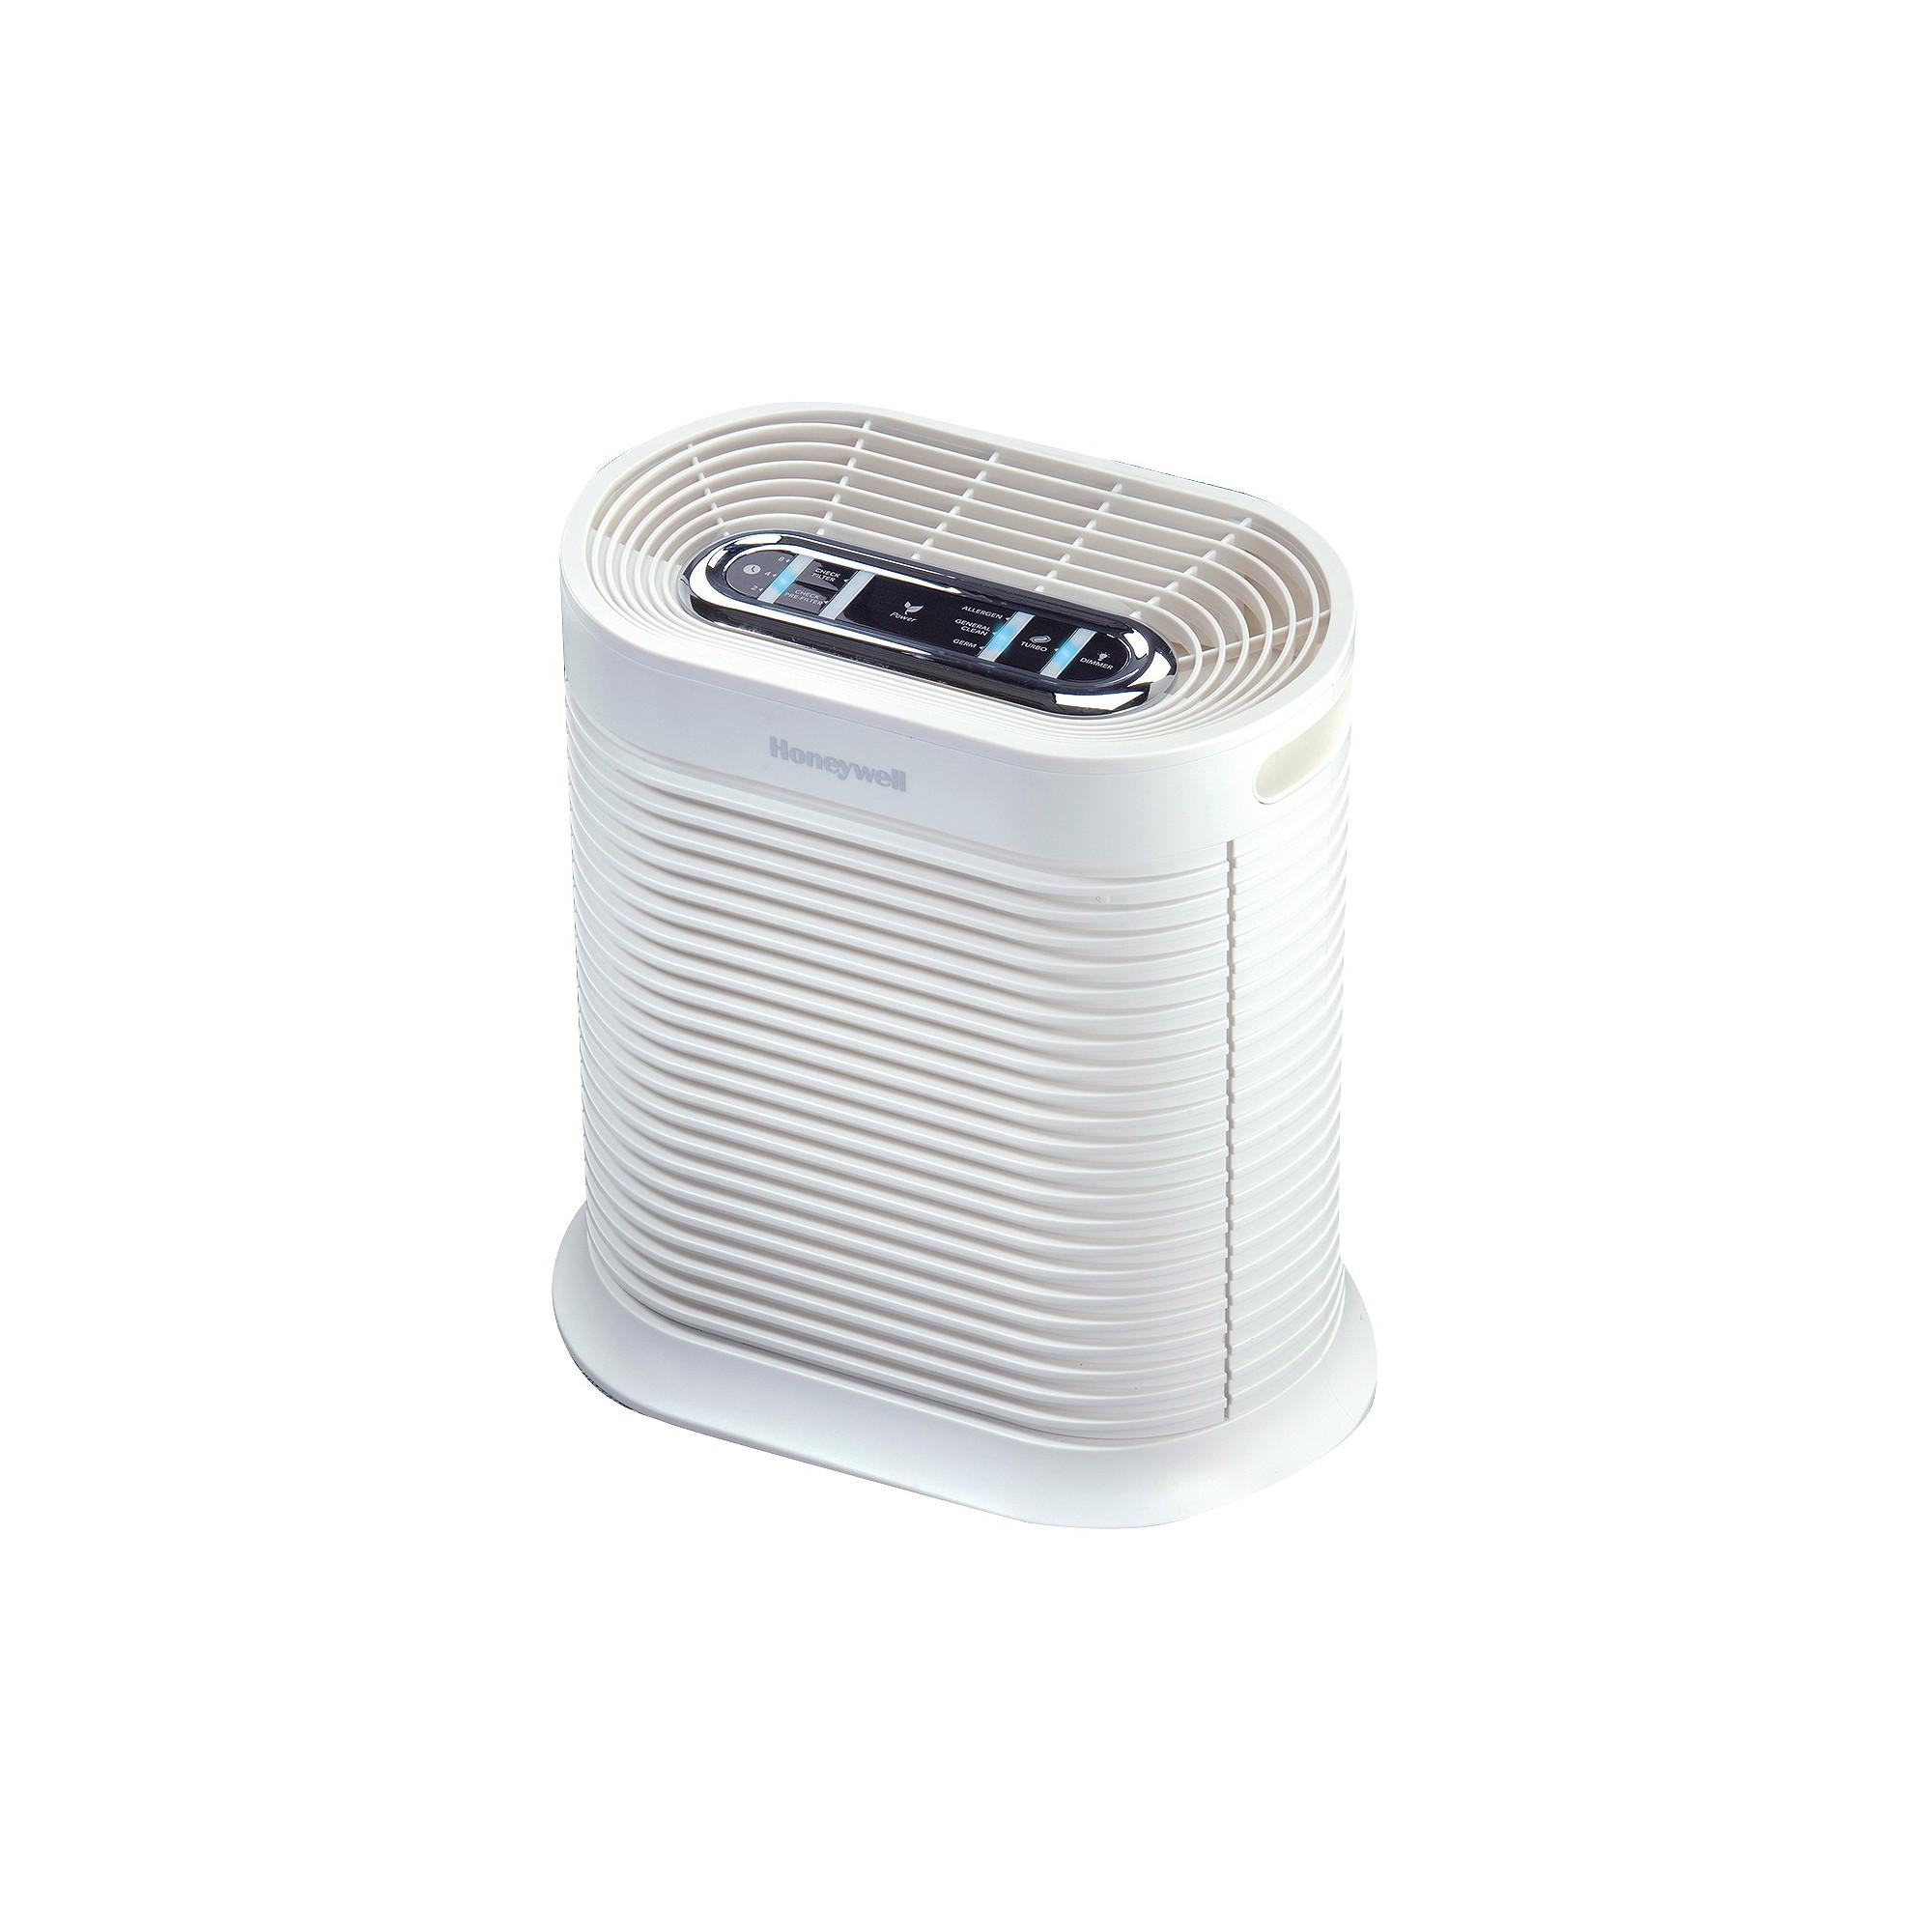 Honeywell True Hepa Allergen Remover Air Purifier HPA105